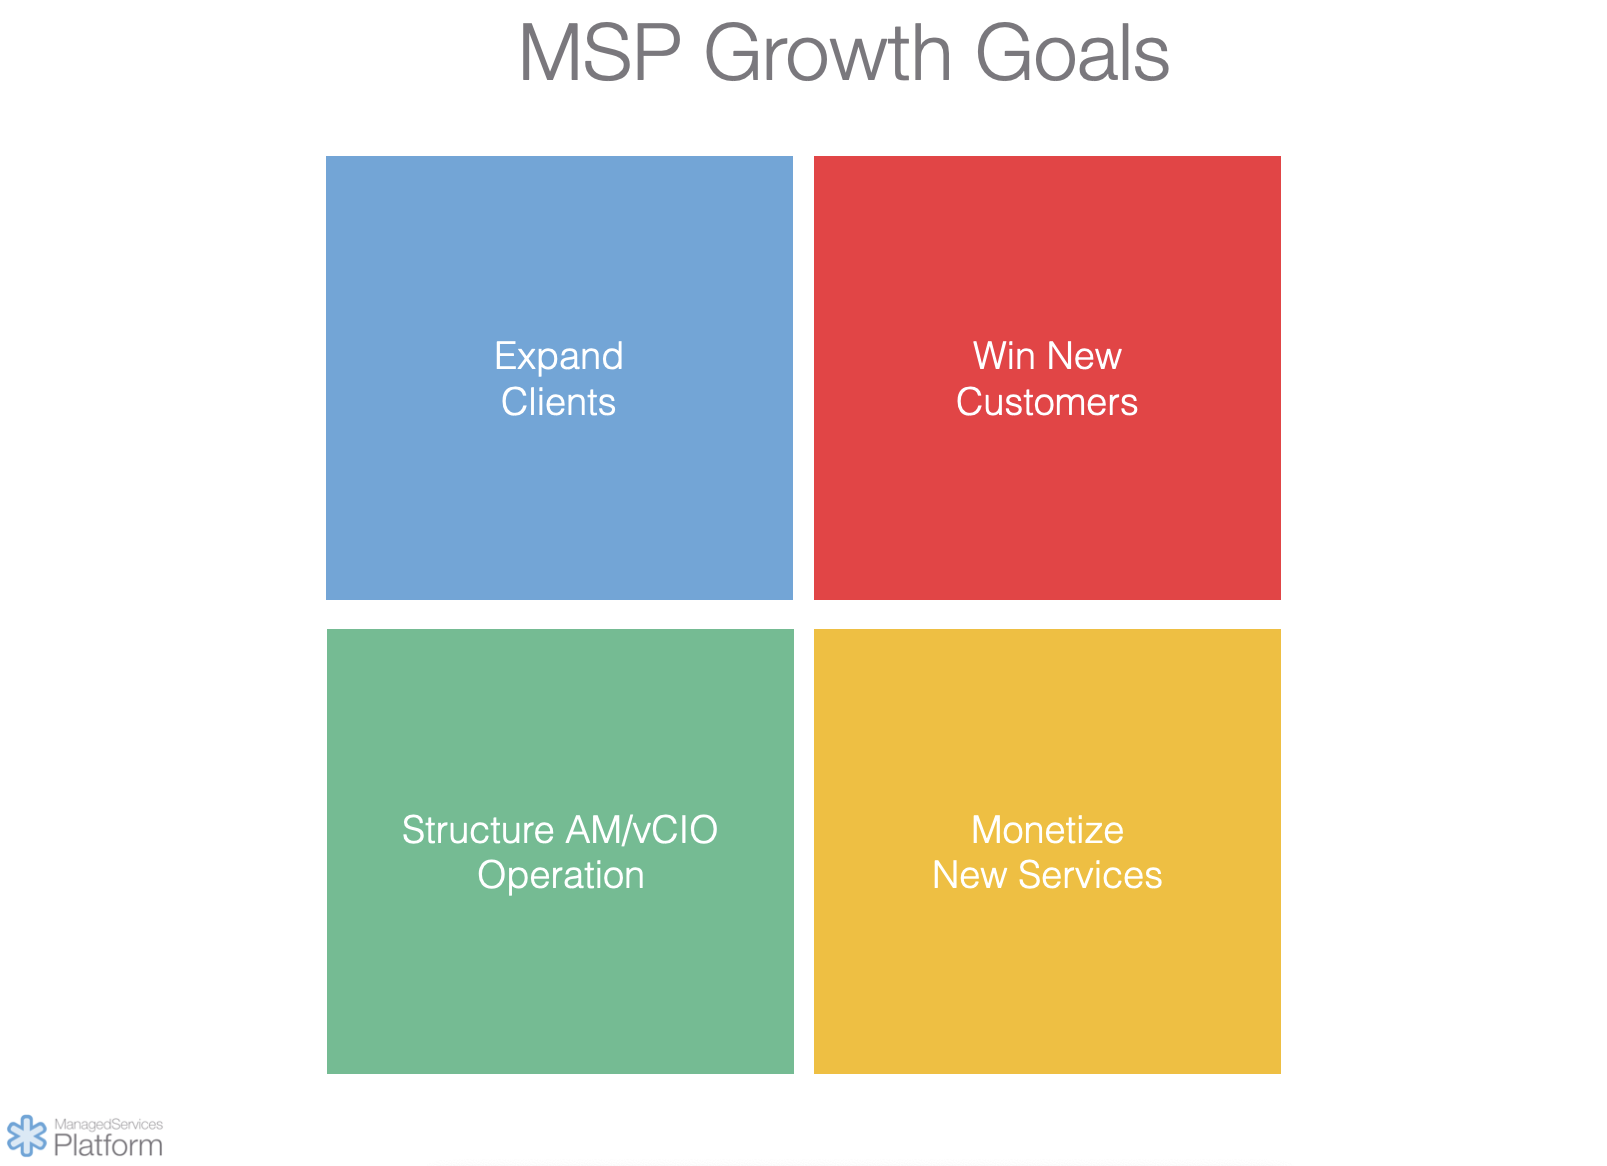 MSP growth goals